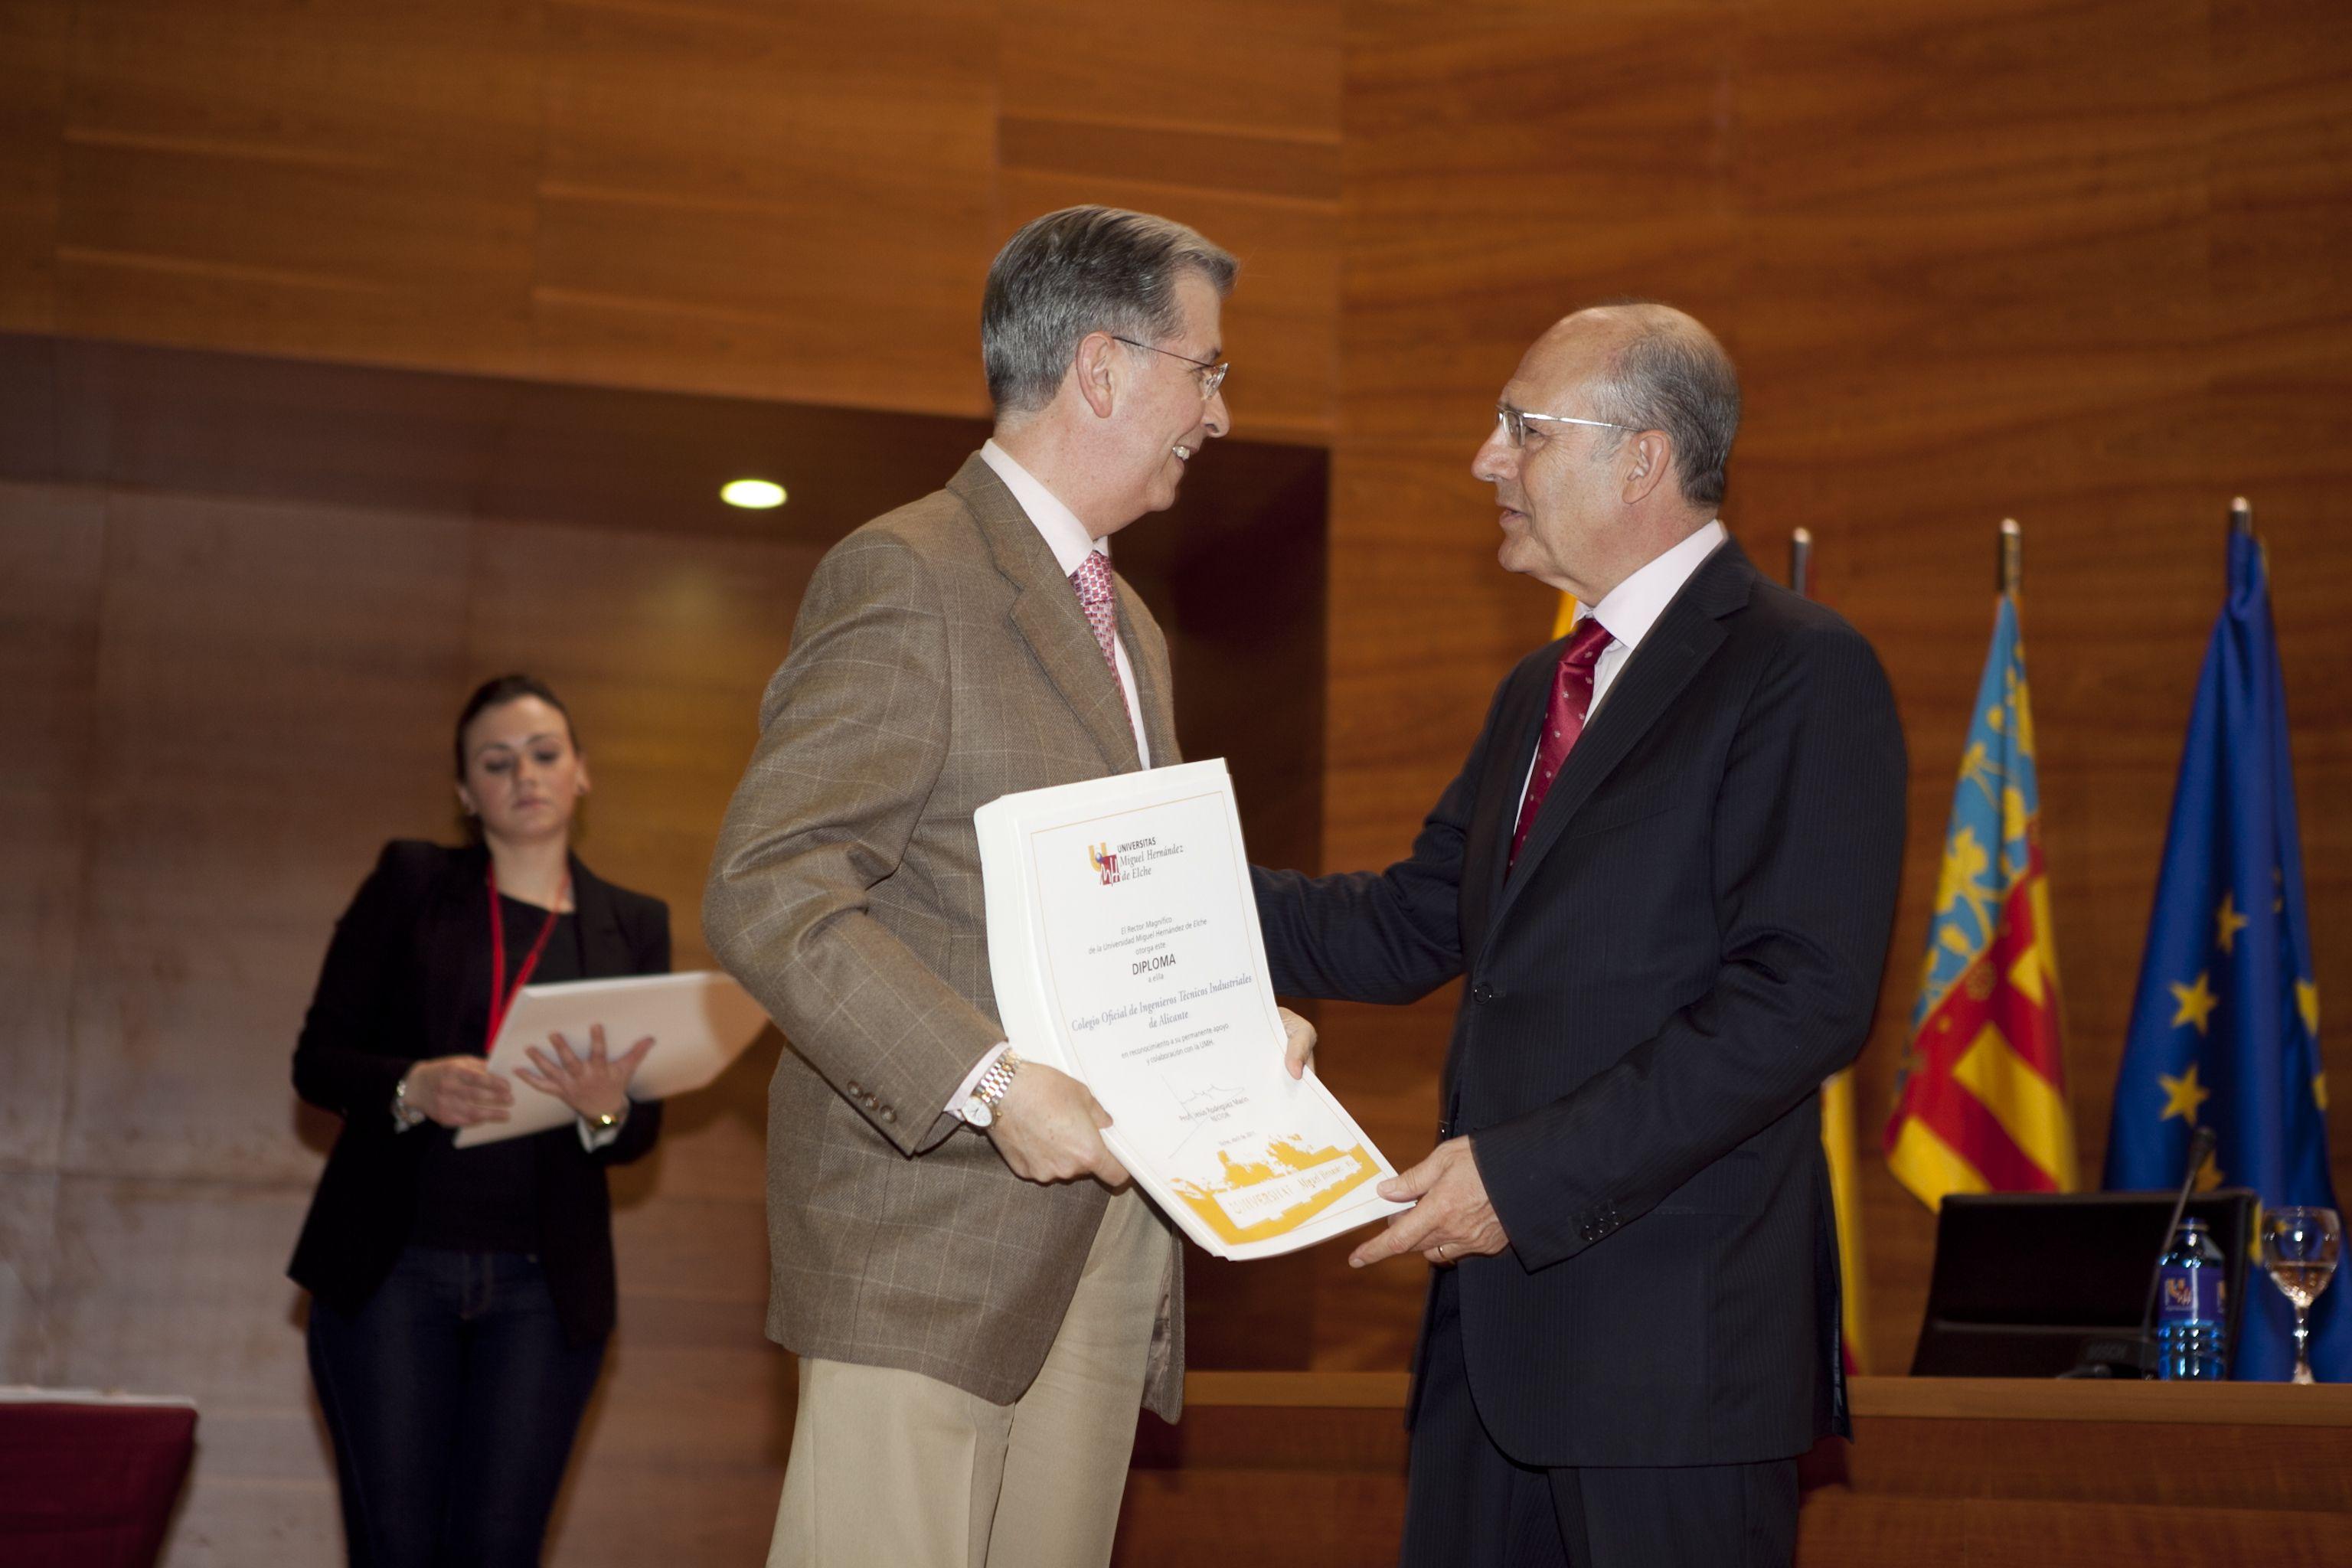 umh-diplomas-rector_mg_6916.jpg